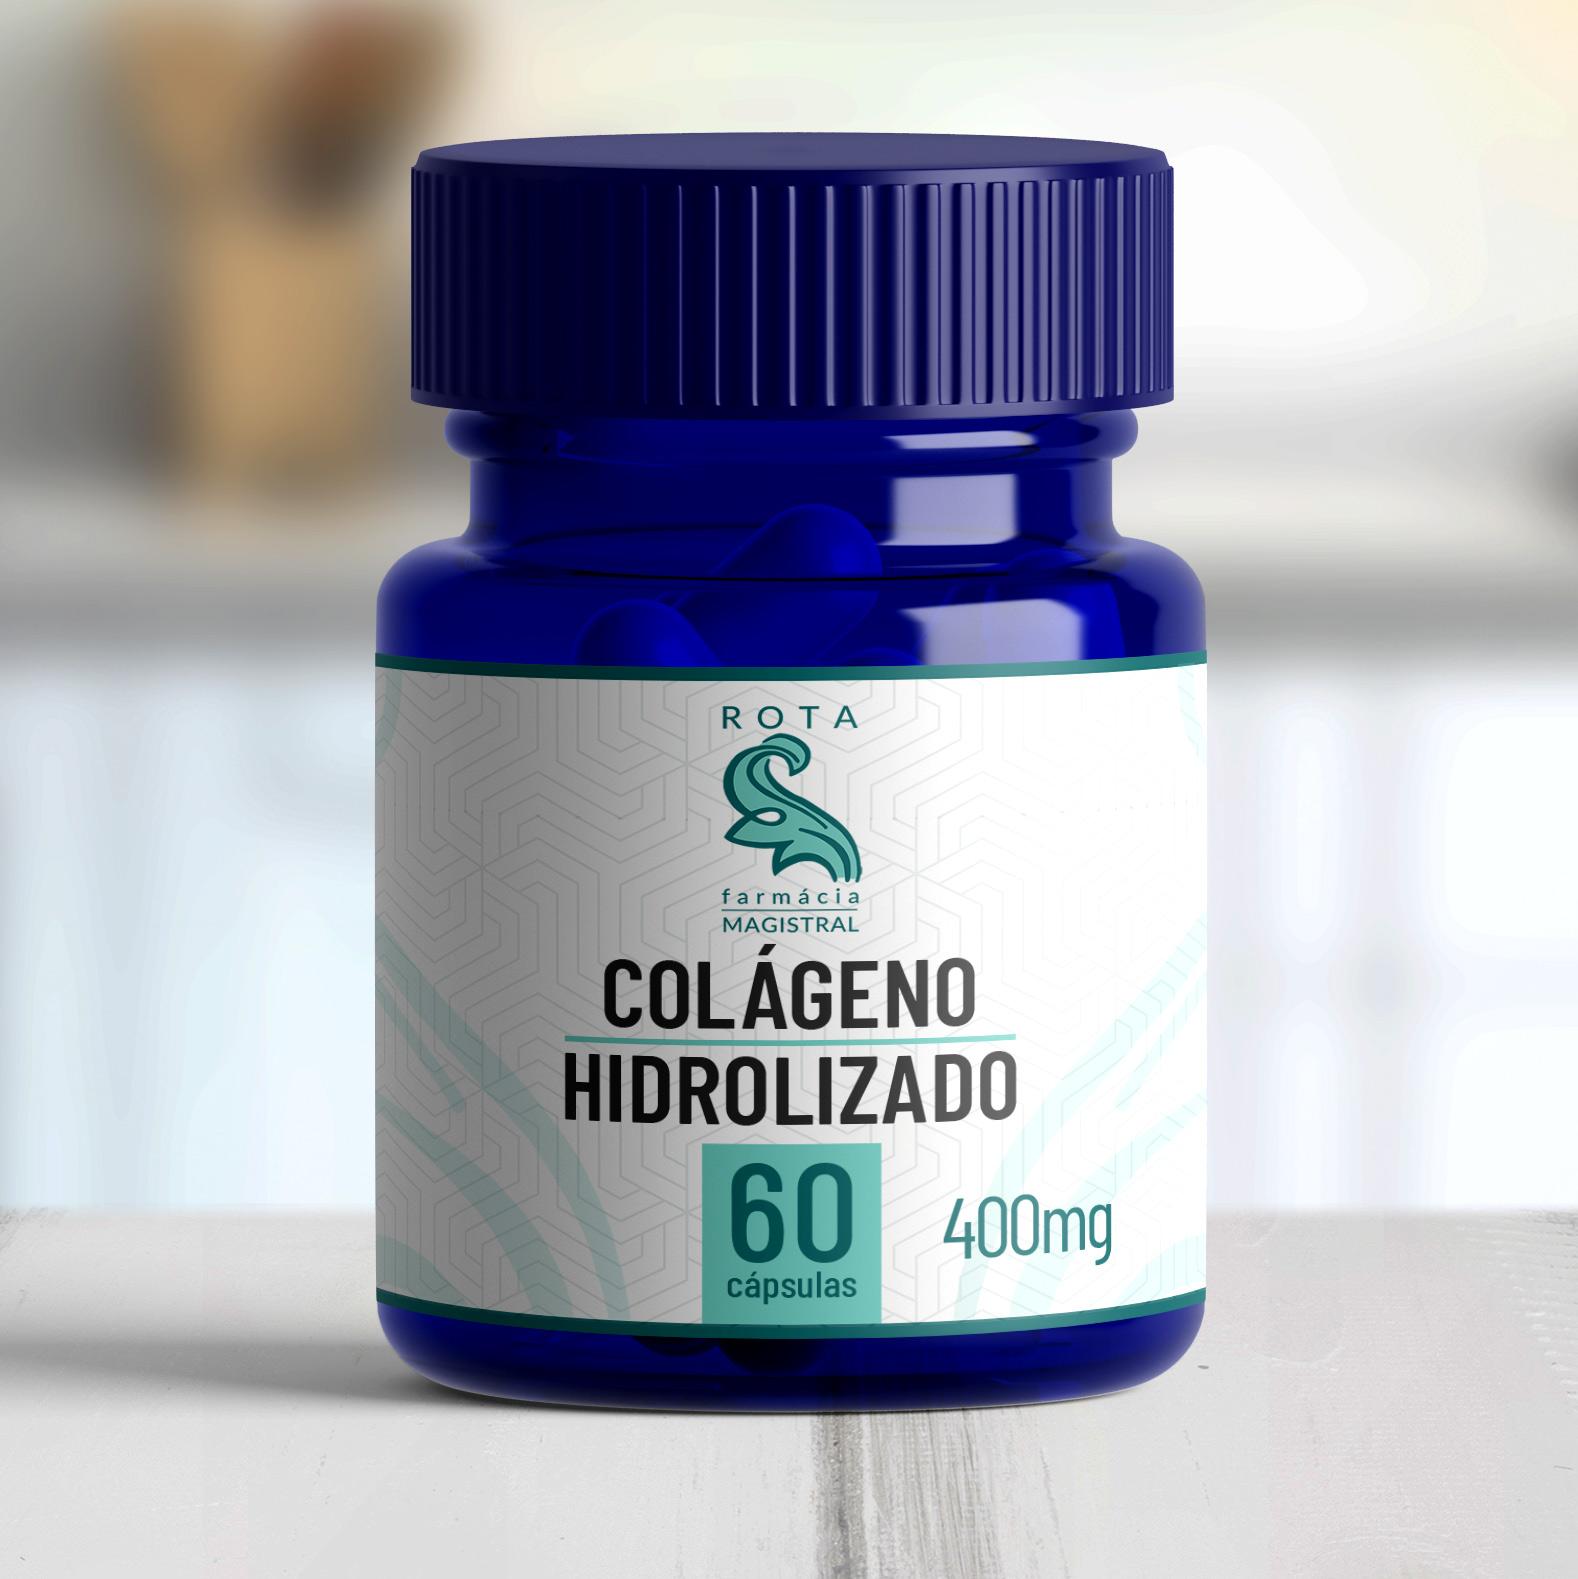 Colágeno Hidrolizado 400mg 60 cápsulas